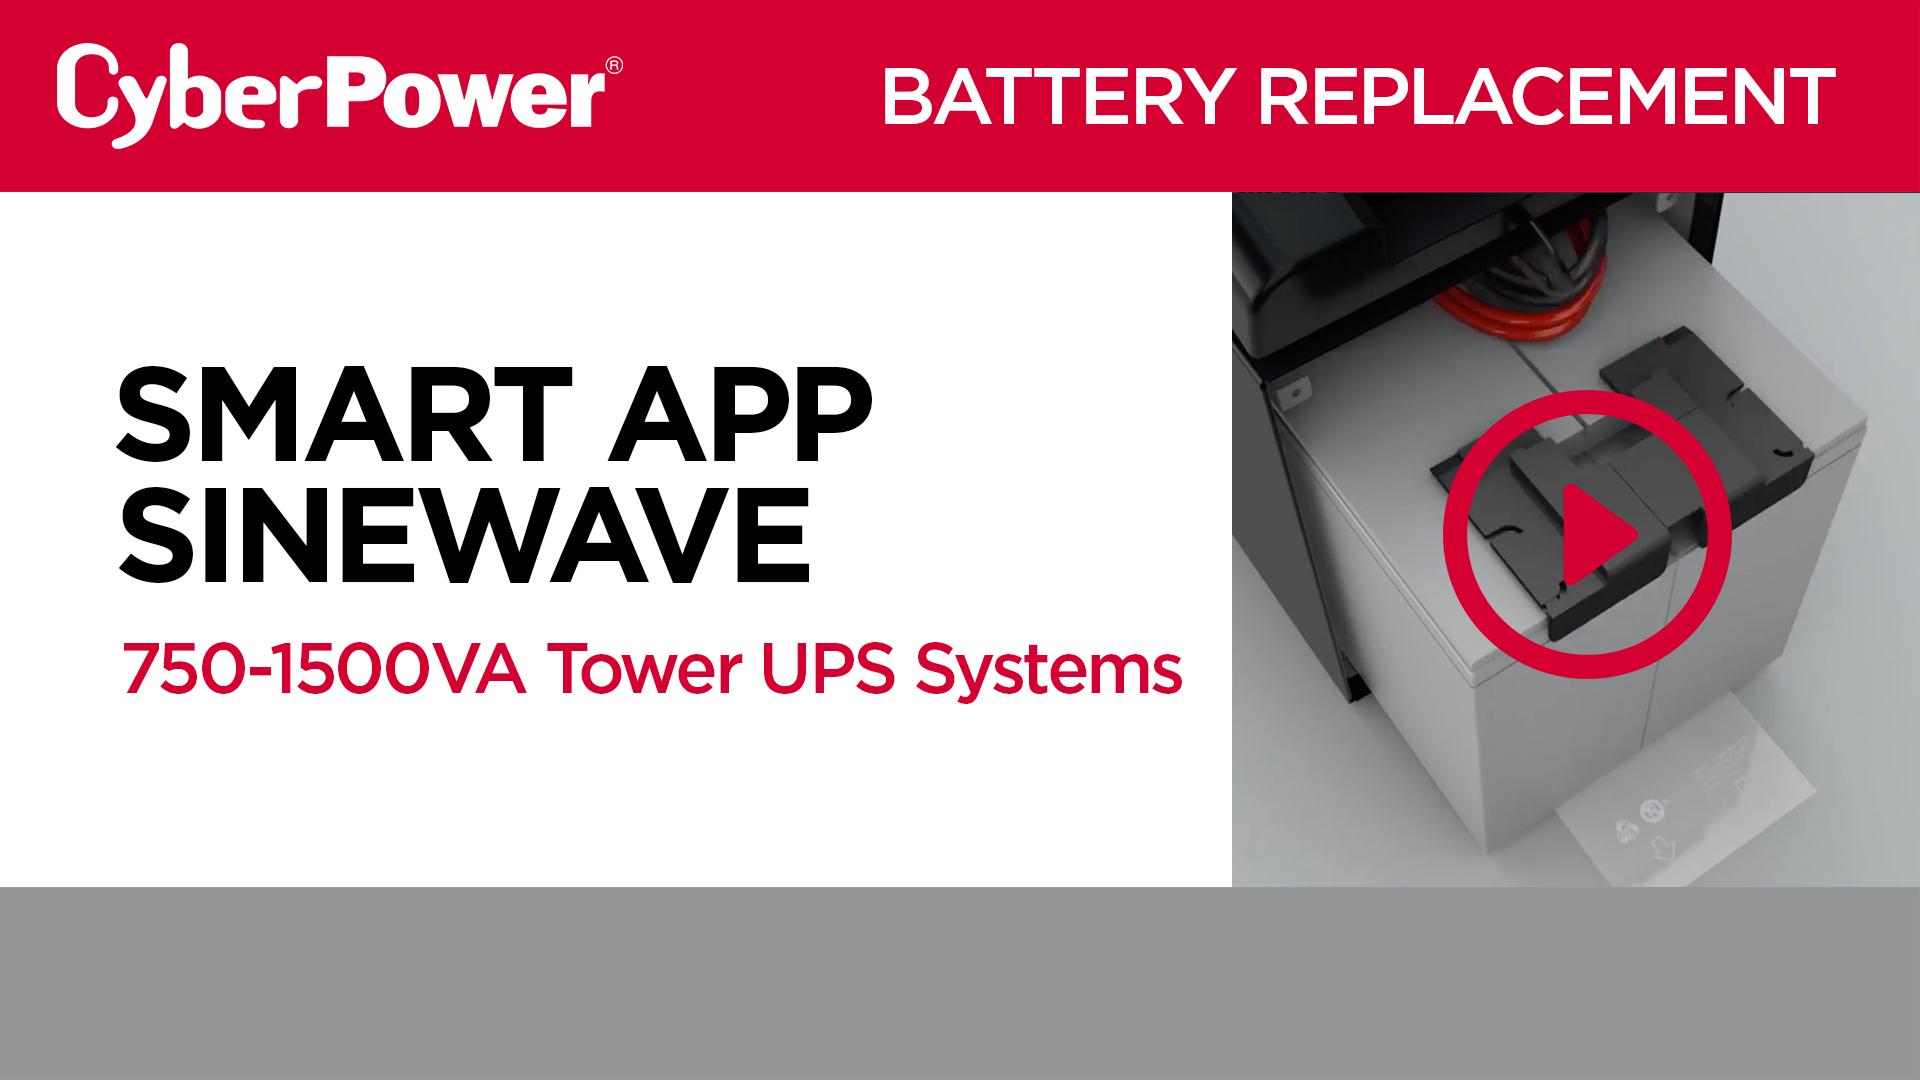 Smart App Sinewave 750-1500VA Tower Replacement Battery